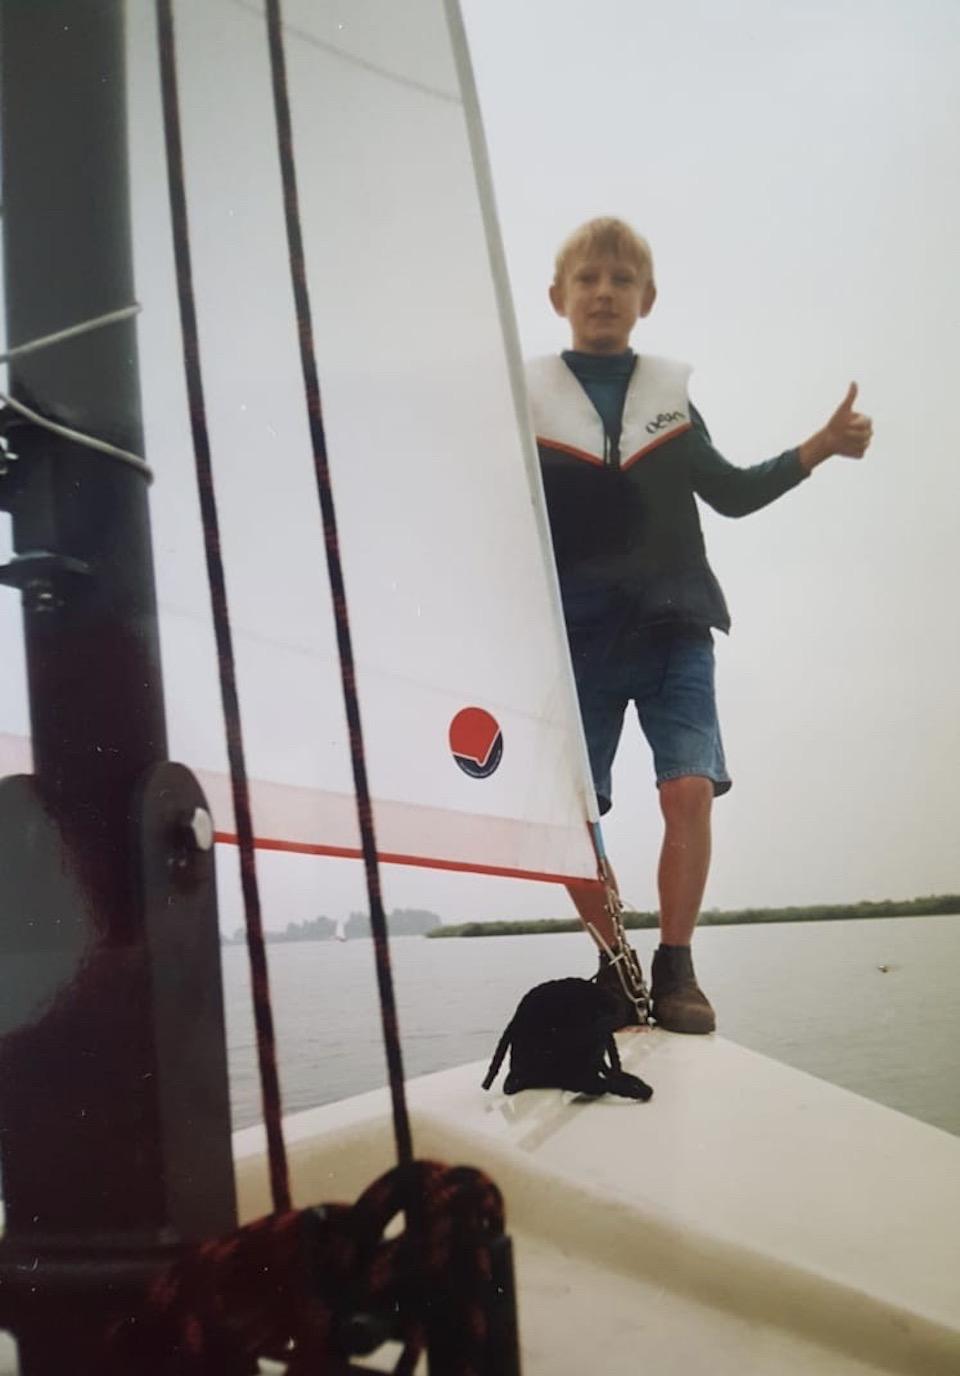 duurzame initiatieven amsterdam, zeedrift door de sailing TAXI Tom de Ruyter